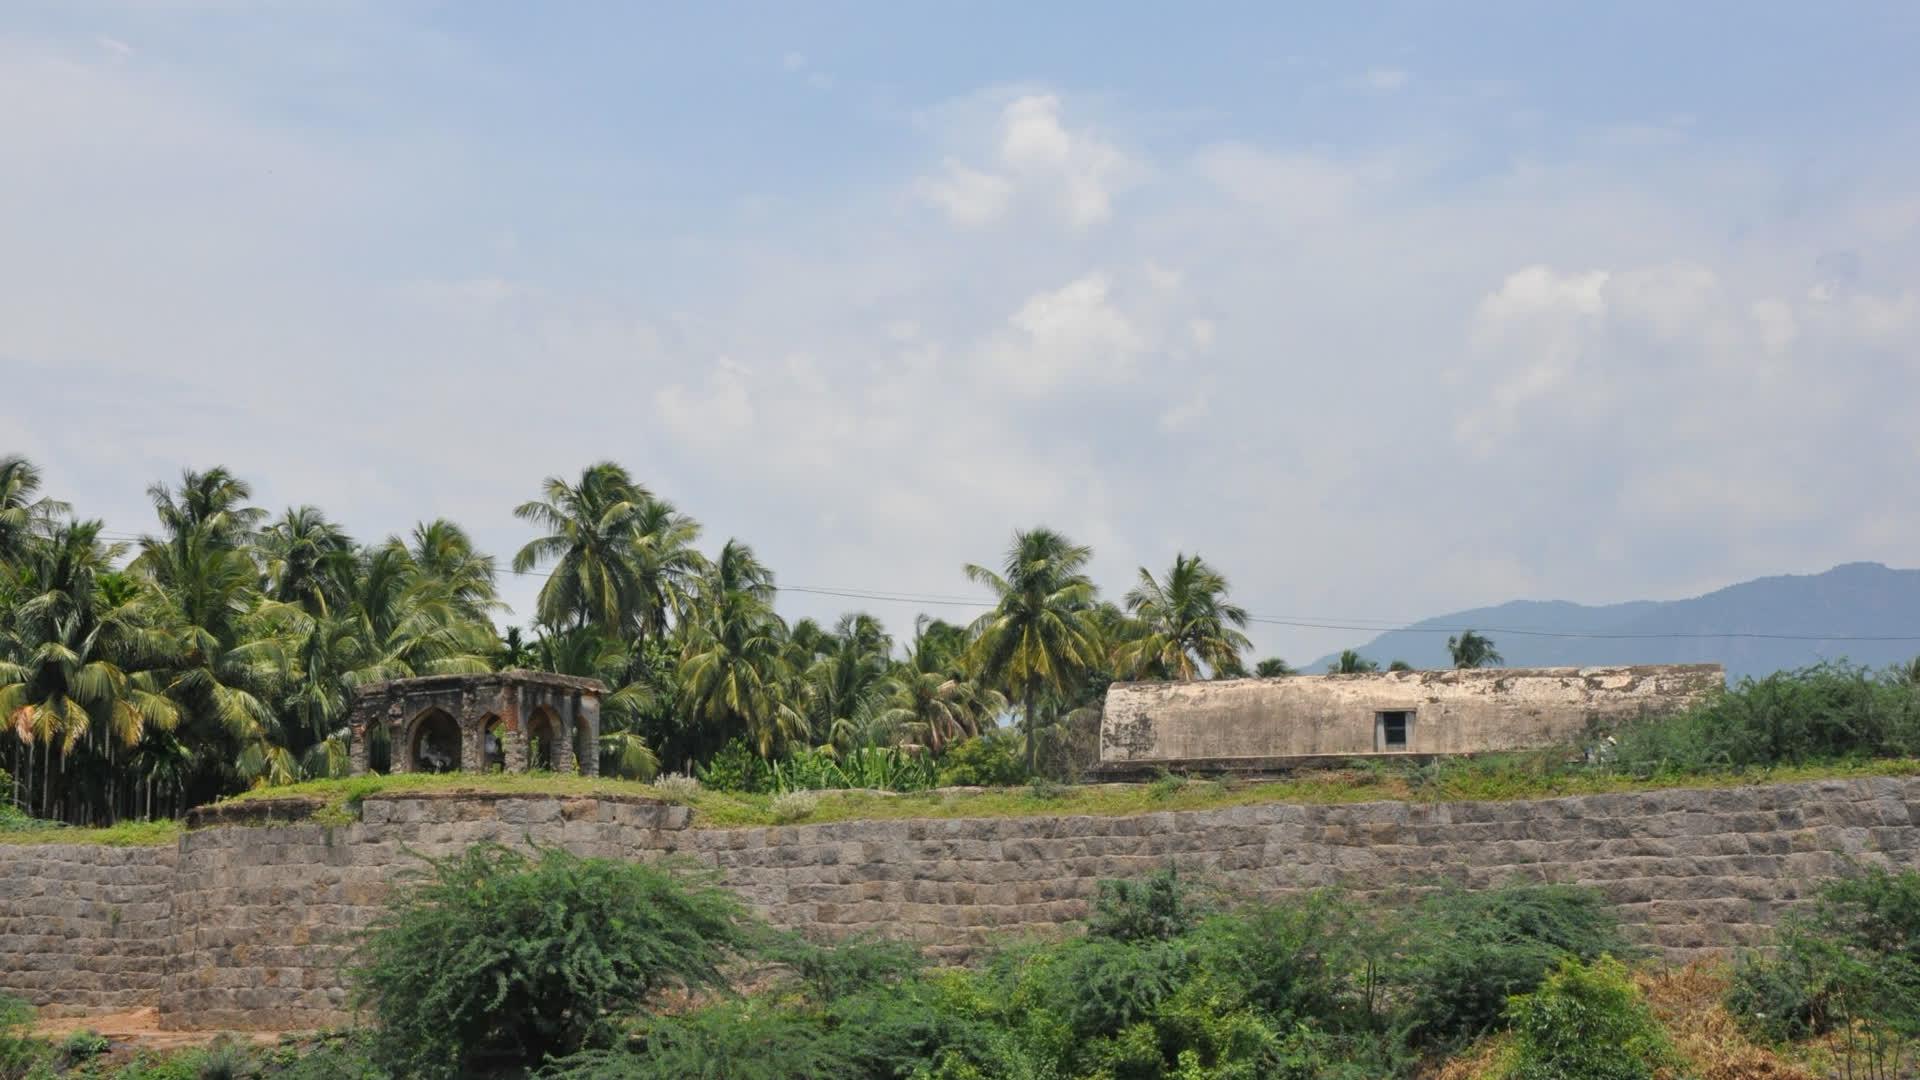 Attur Fort: Salem's Little, Big Fort